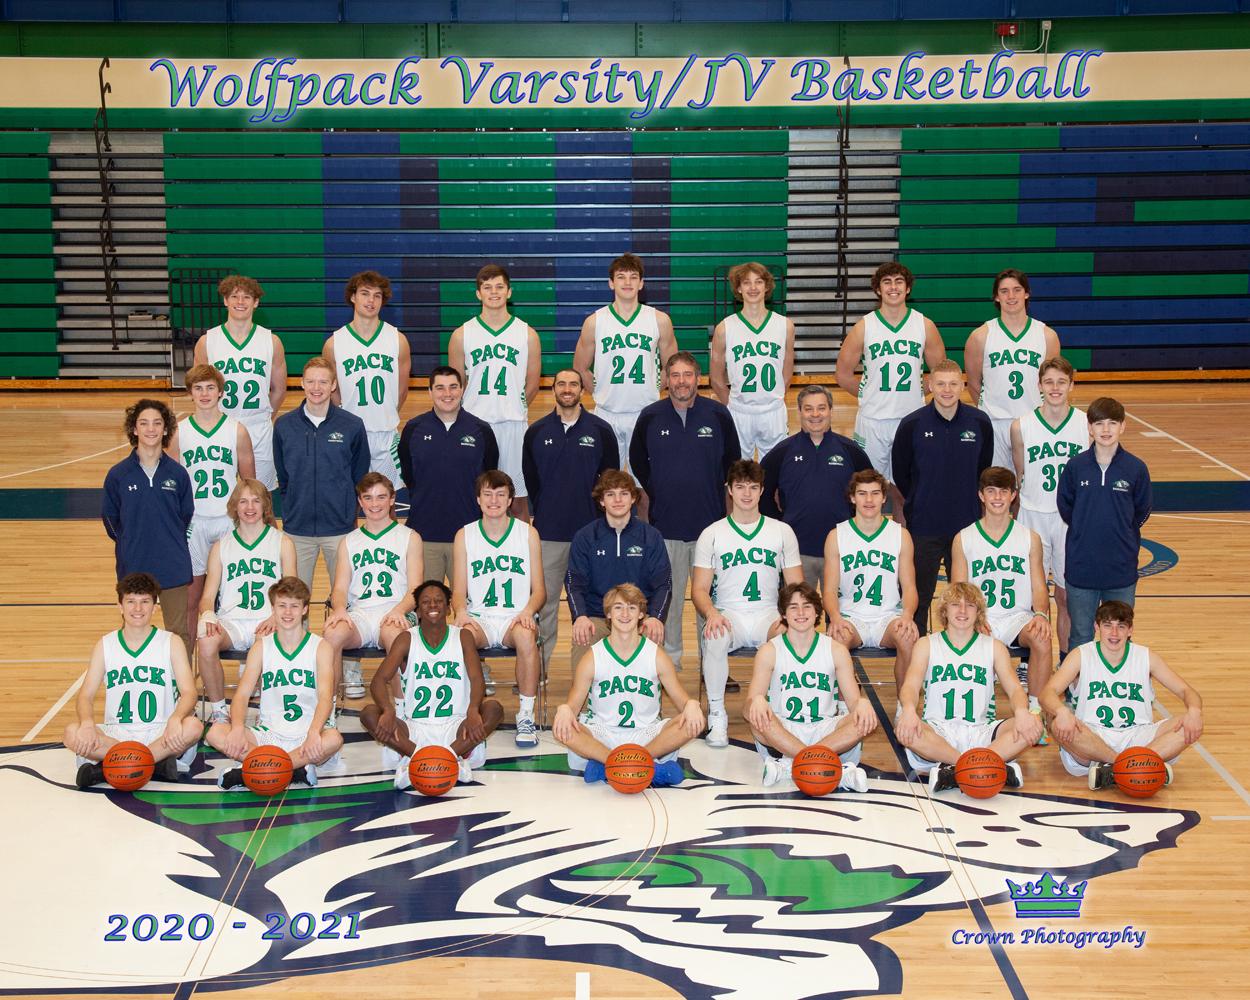 Glacier High School Varsity Basketball